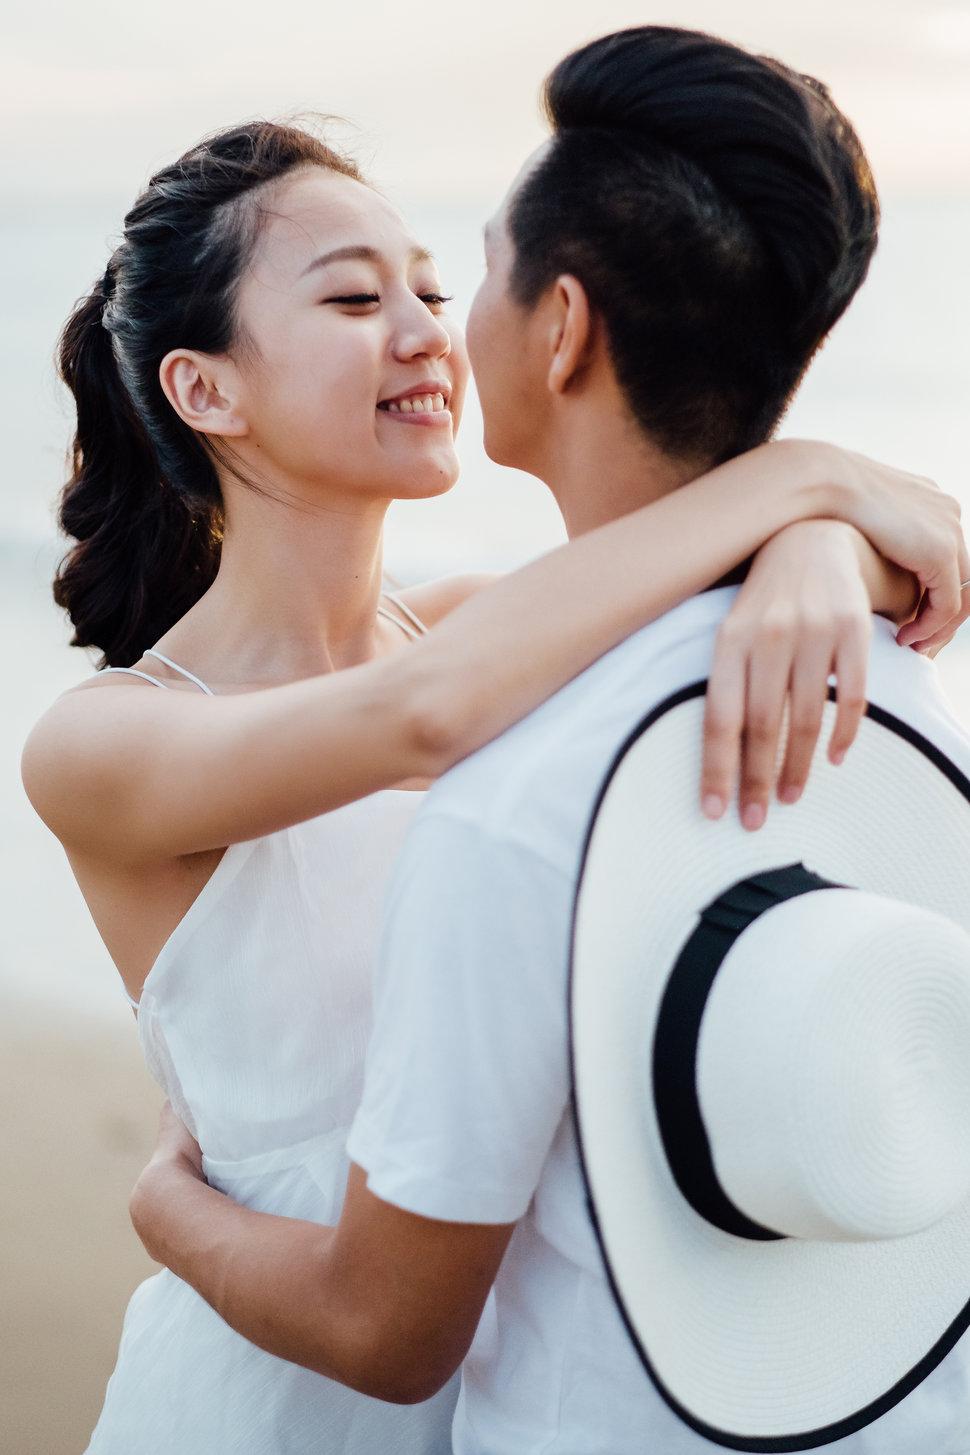 2017-07-22-18h26m46-DSCF7806 - Vicky Li 新娘秘書《結婚吧》